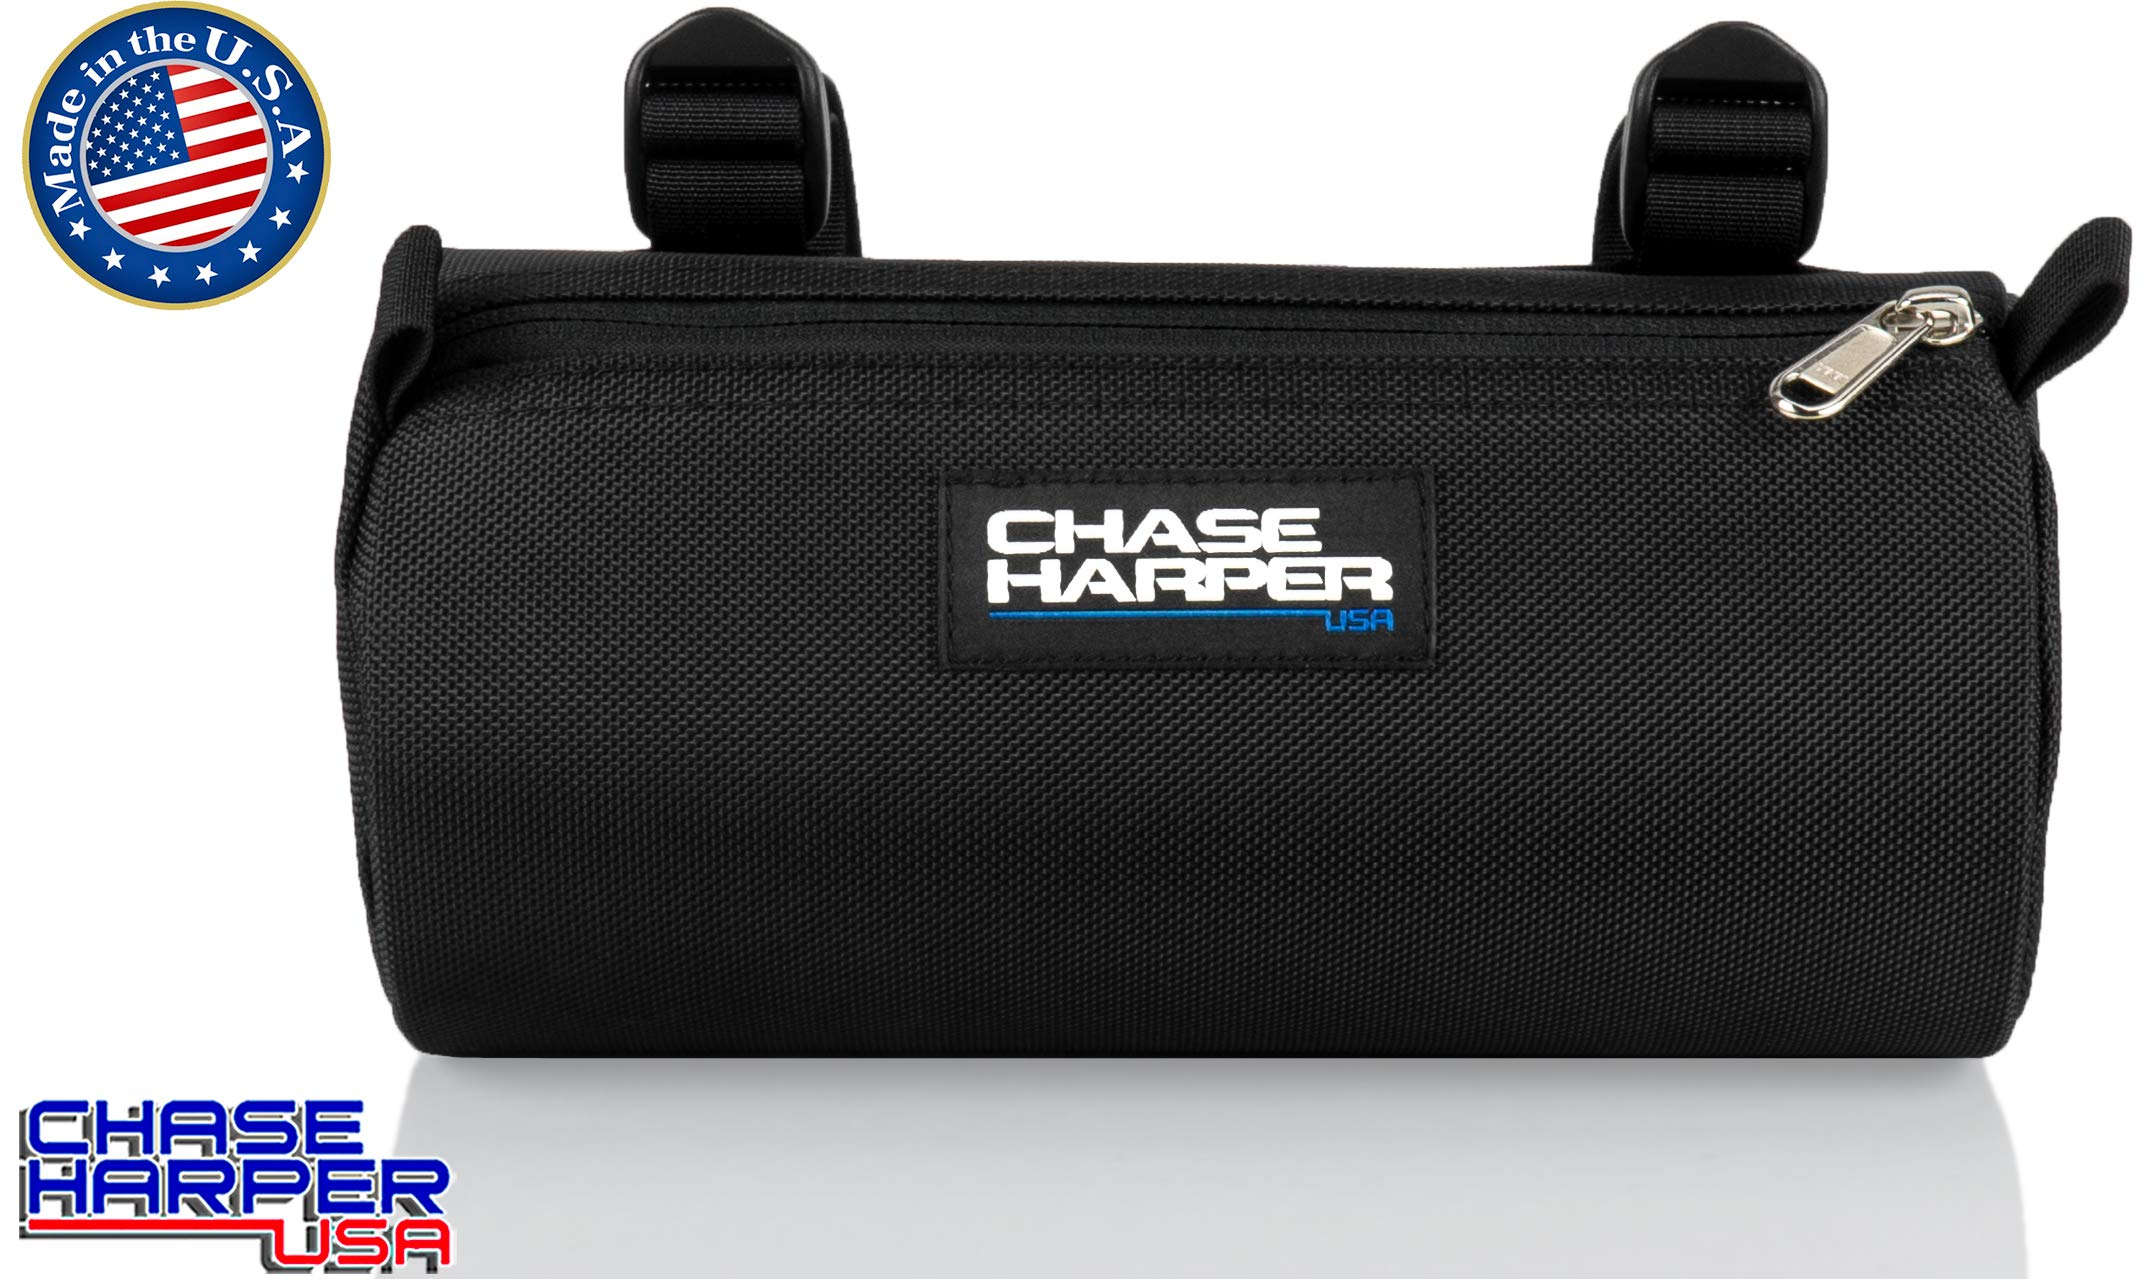 Chase Harper USA 10300 Black BC Barrel Bag - 3.5 Liters - Water-Resistant, Tear-Resistant, Industrial Grade Ballistic Nylon - Universal Fit